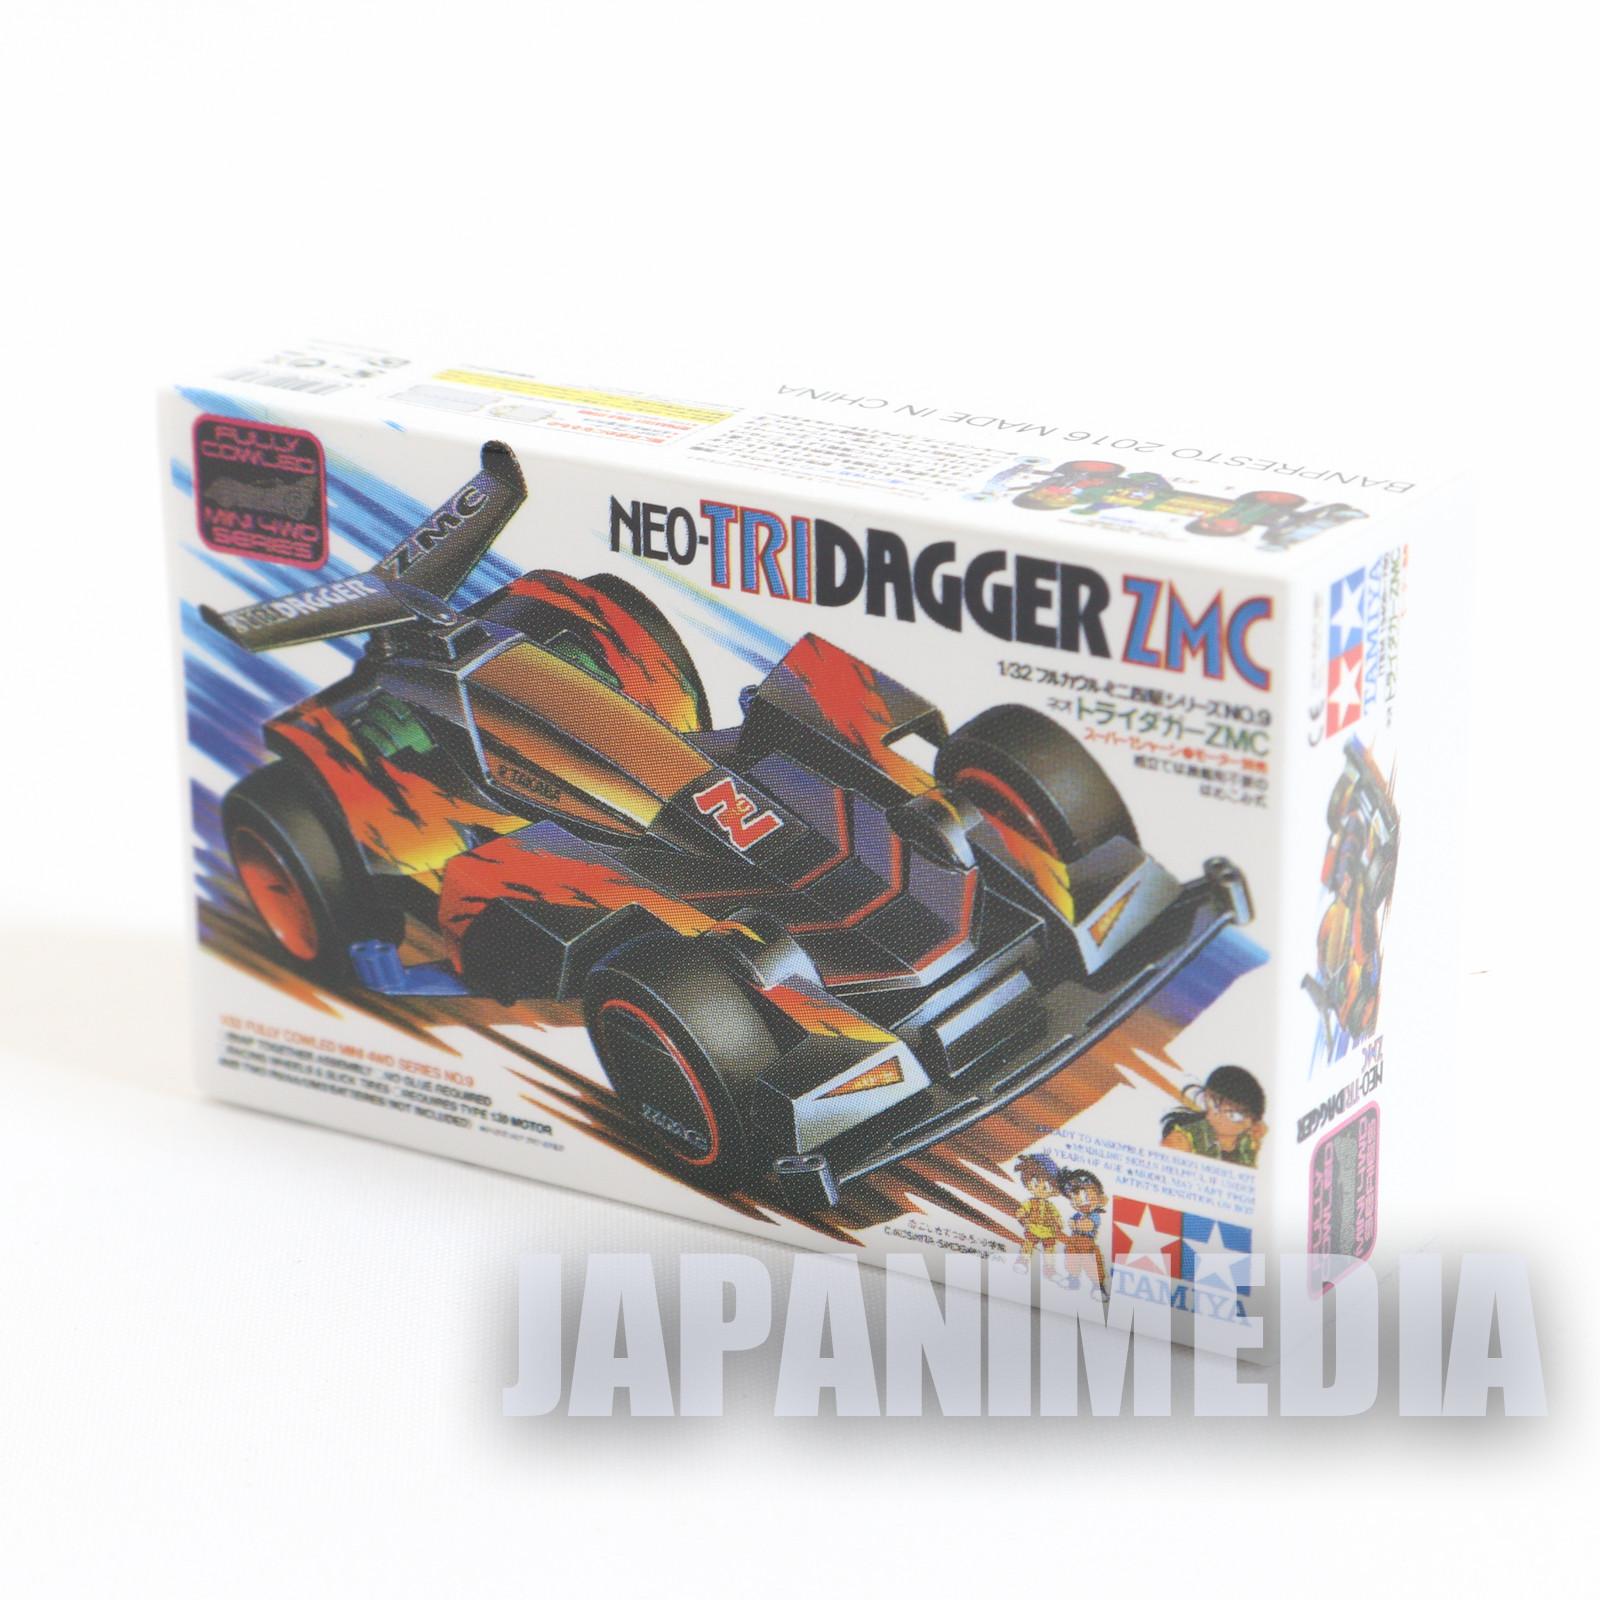 Bakusou Kyoudai Let's & Go!! Small Case Strap Mini 4WD Neo-TRIDagger ZMC TAMIYA